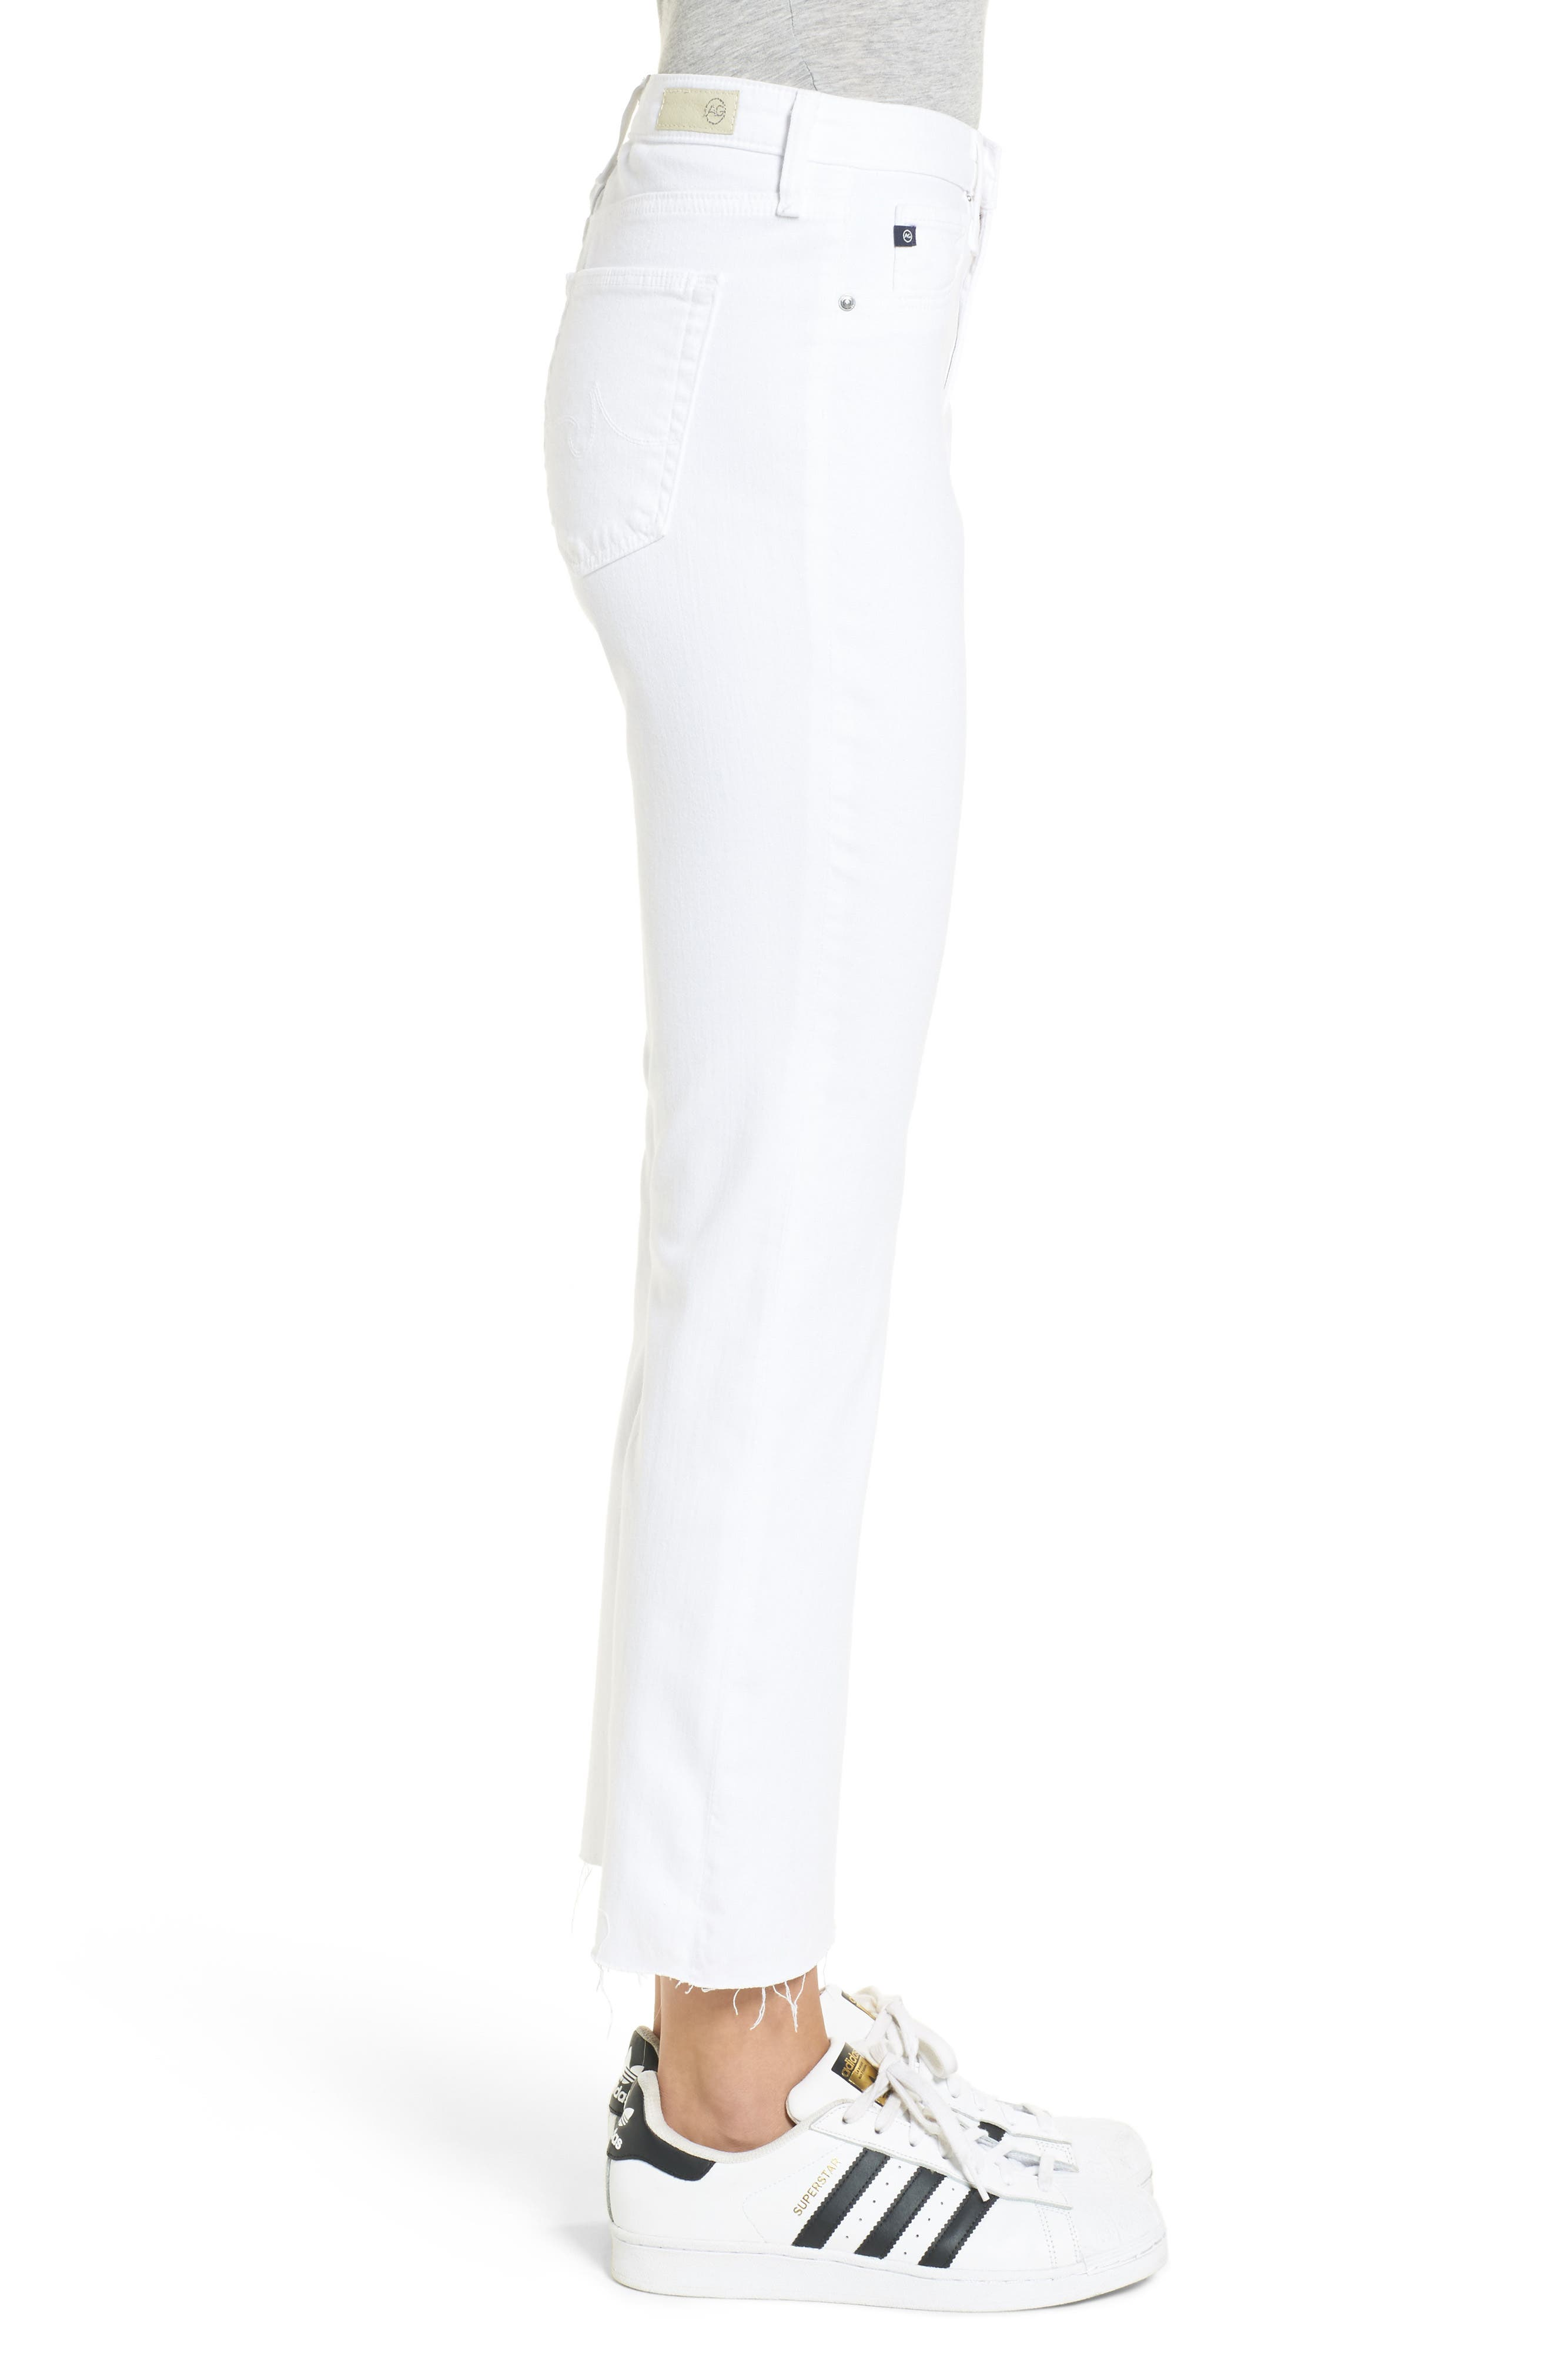 AG, Jodi High Waist Crop Jeans, Alternate thumbnail 4, color, WHITE